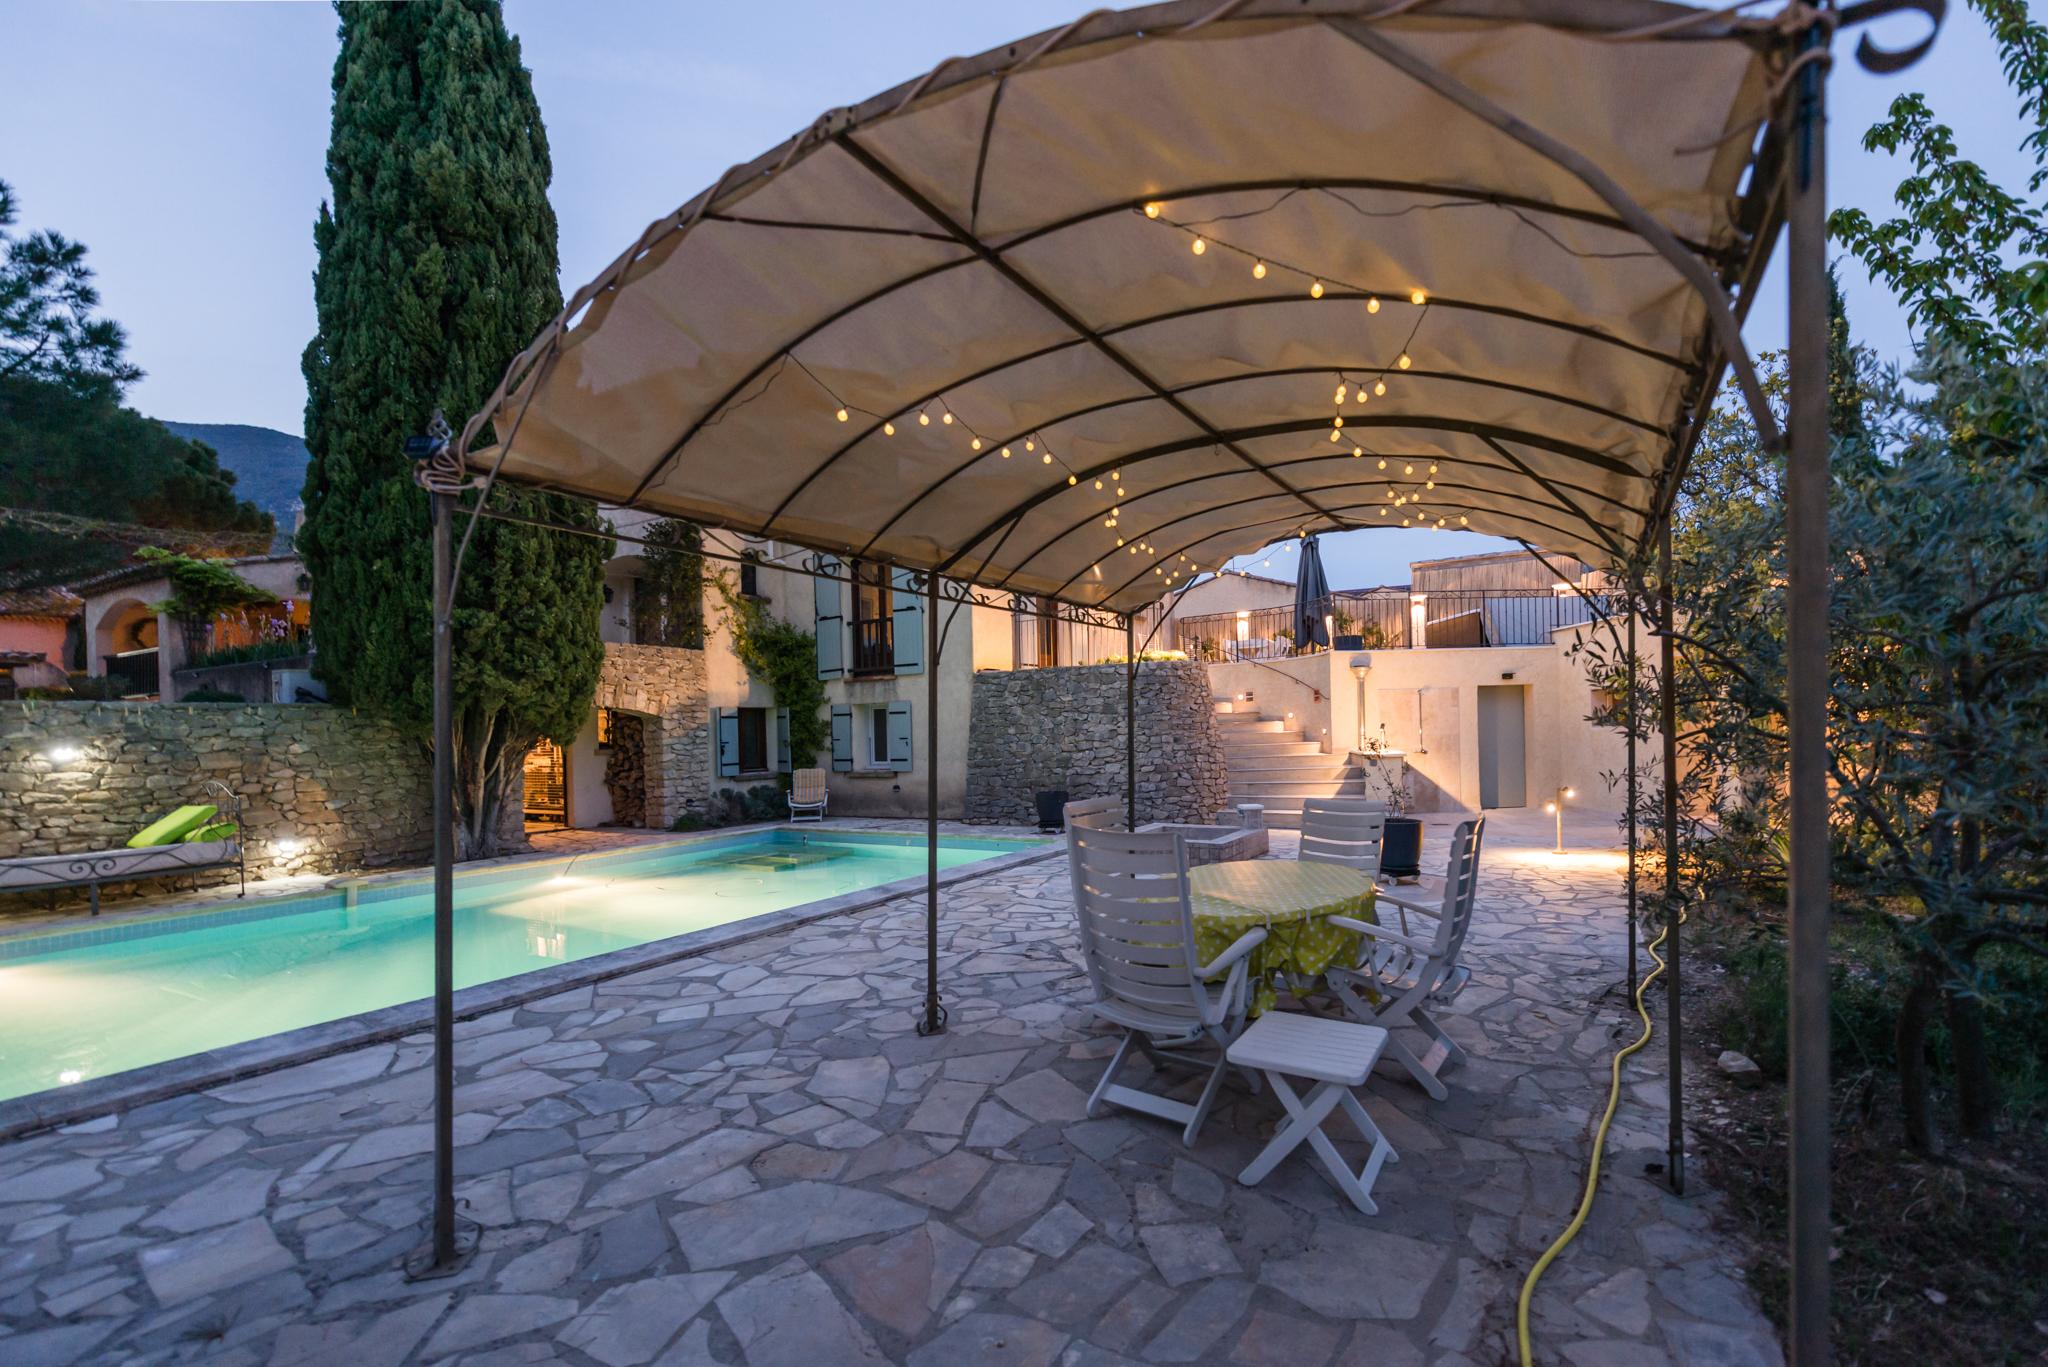 feriebolig-frankrig-sauna-pool-DSC_4818.jpg